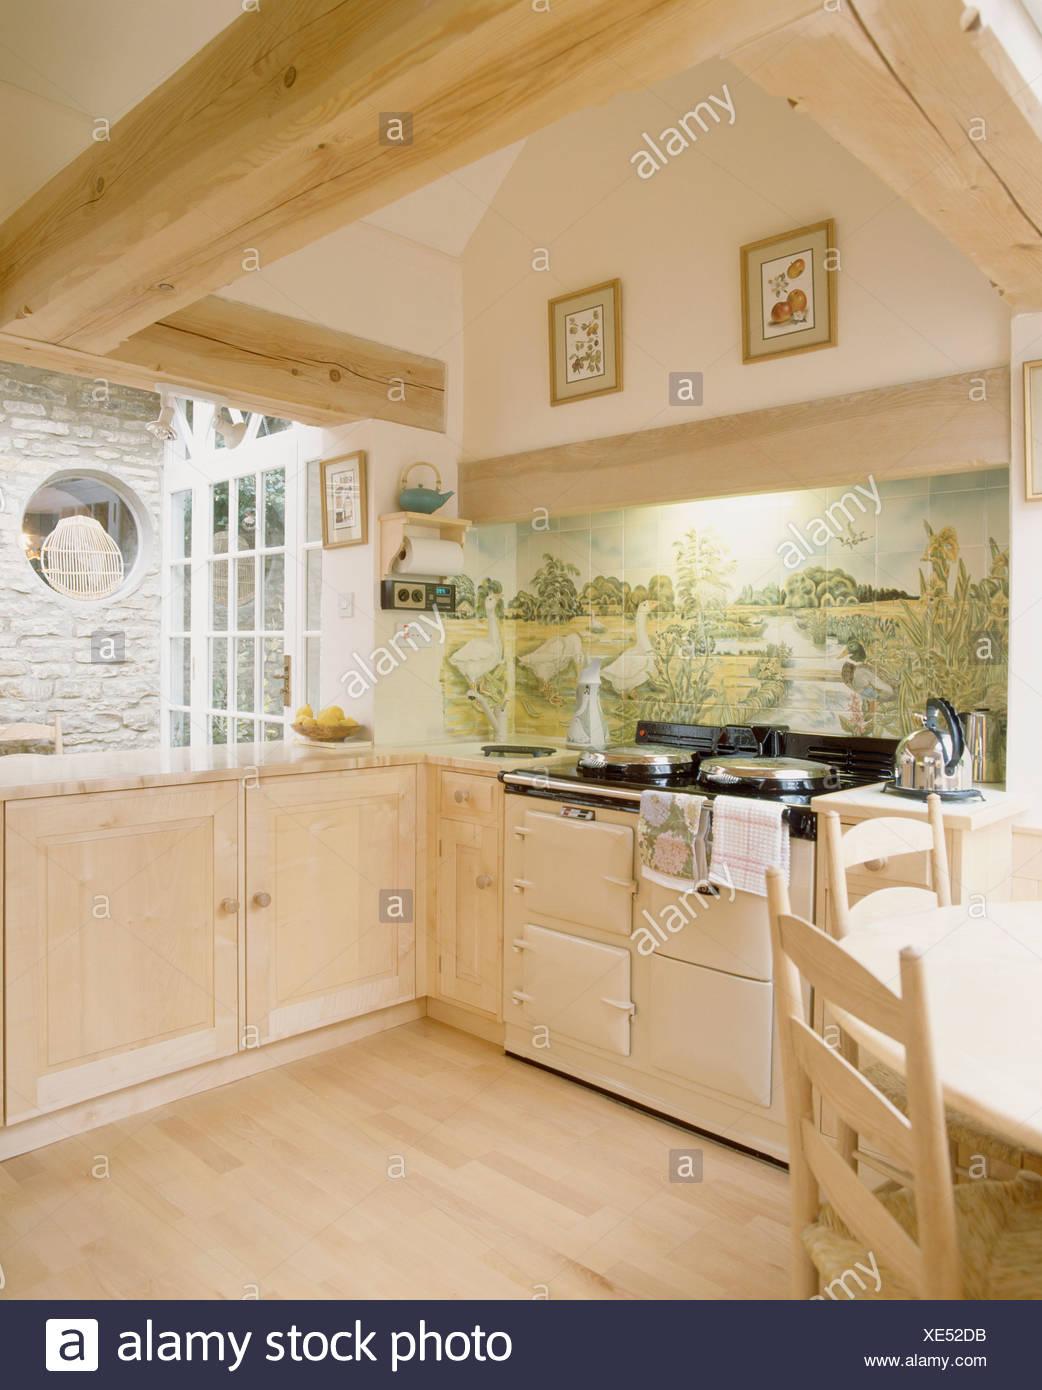 Cream Aga Oven In Country Imágenes De Stock & Cream Aga Oven In ...